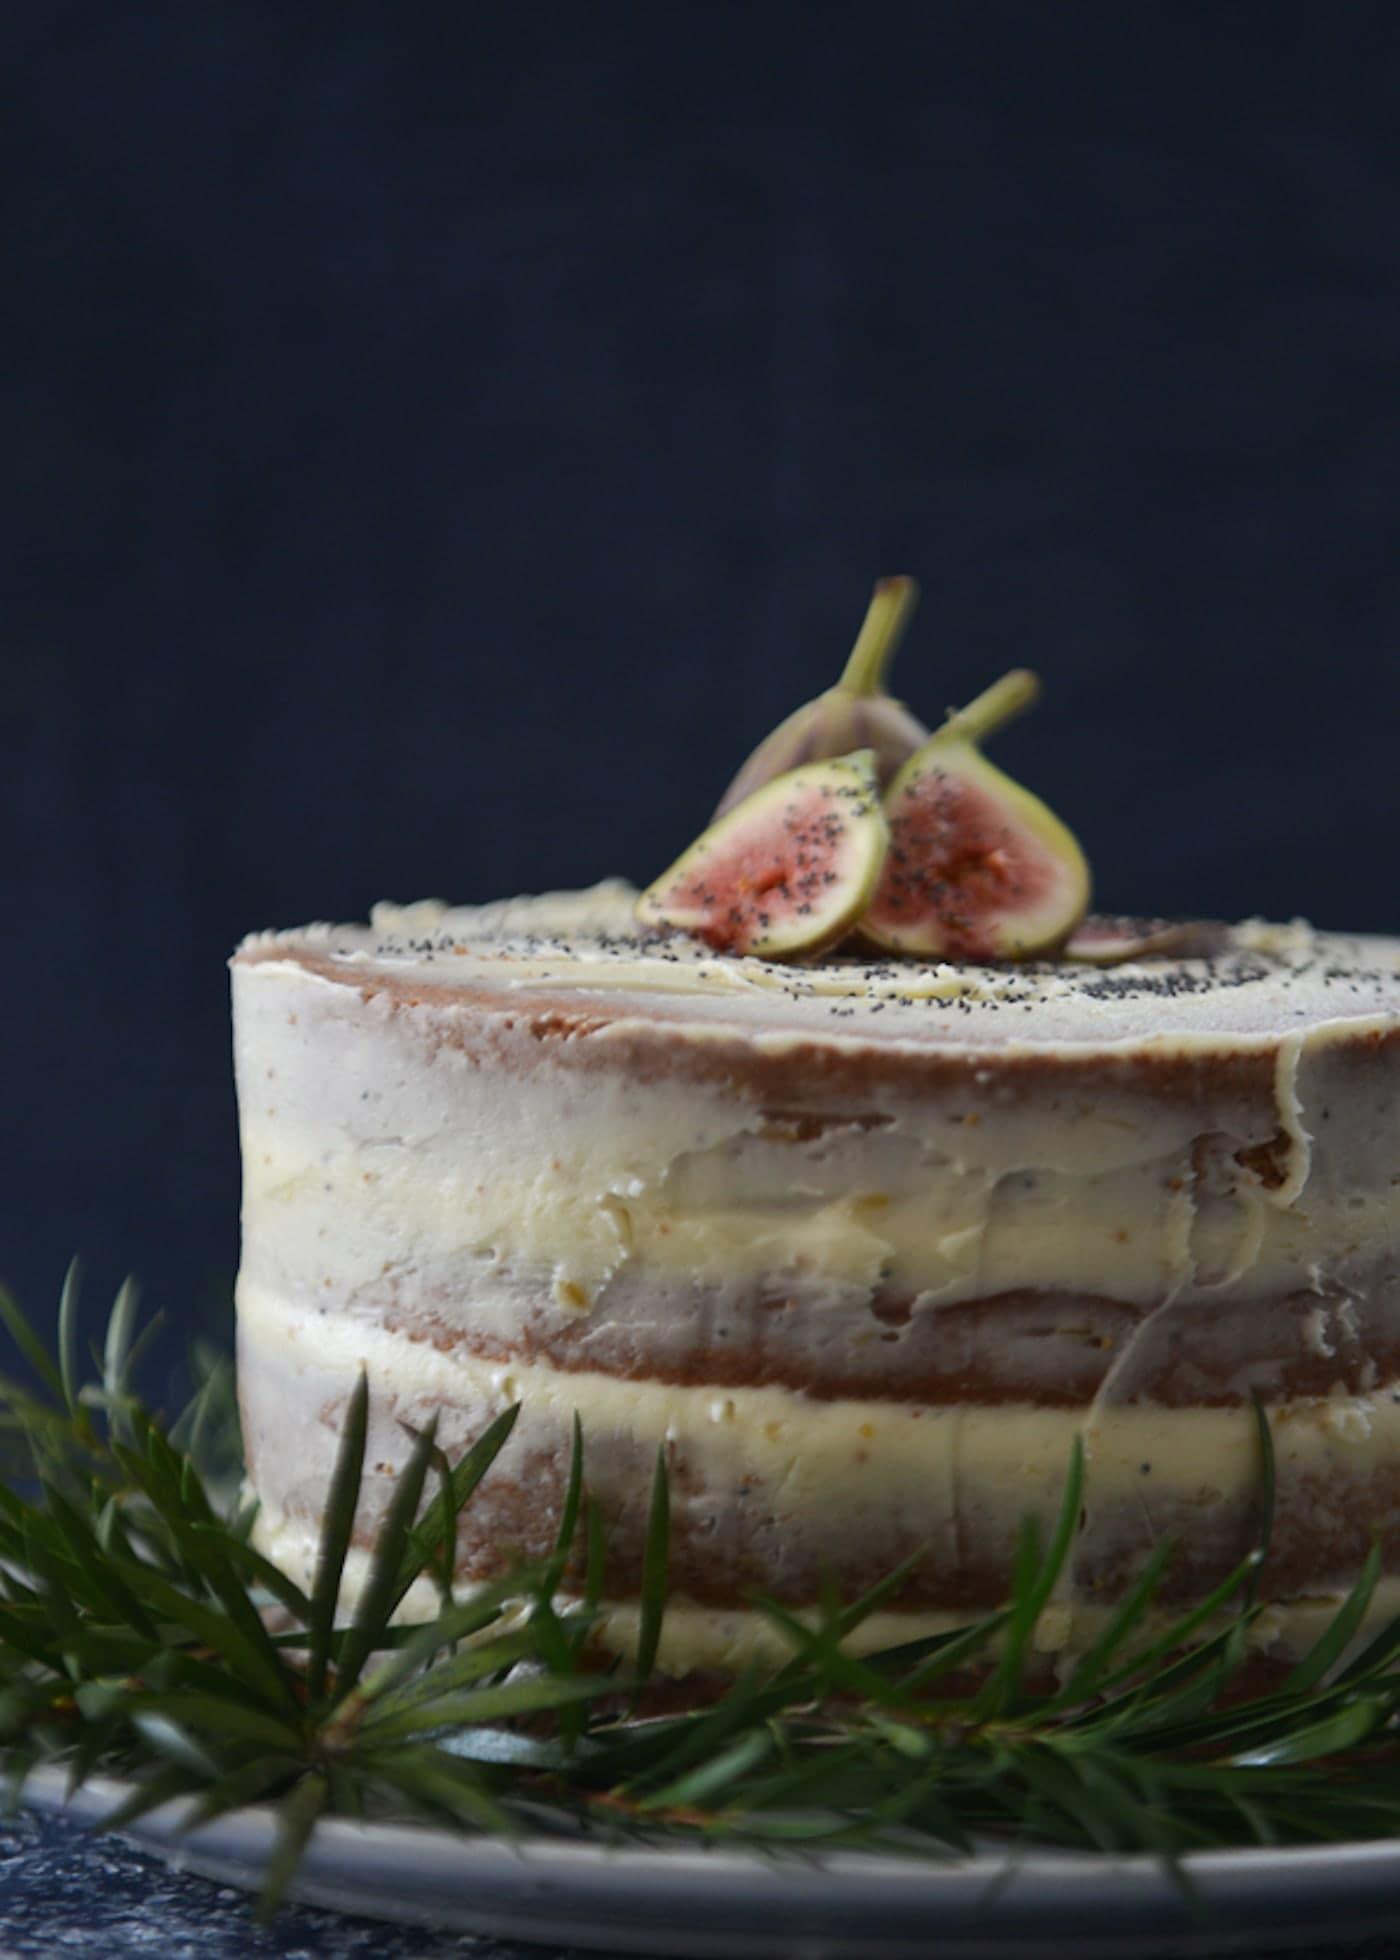 West Elm 12 Days of Christmas Winter Spiced Cake-1